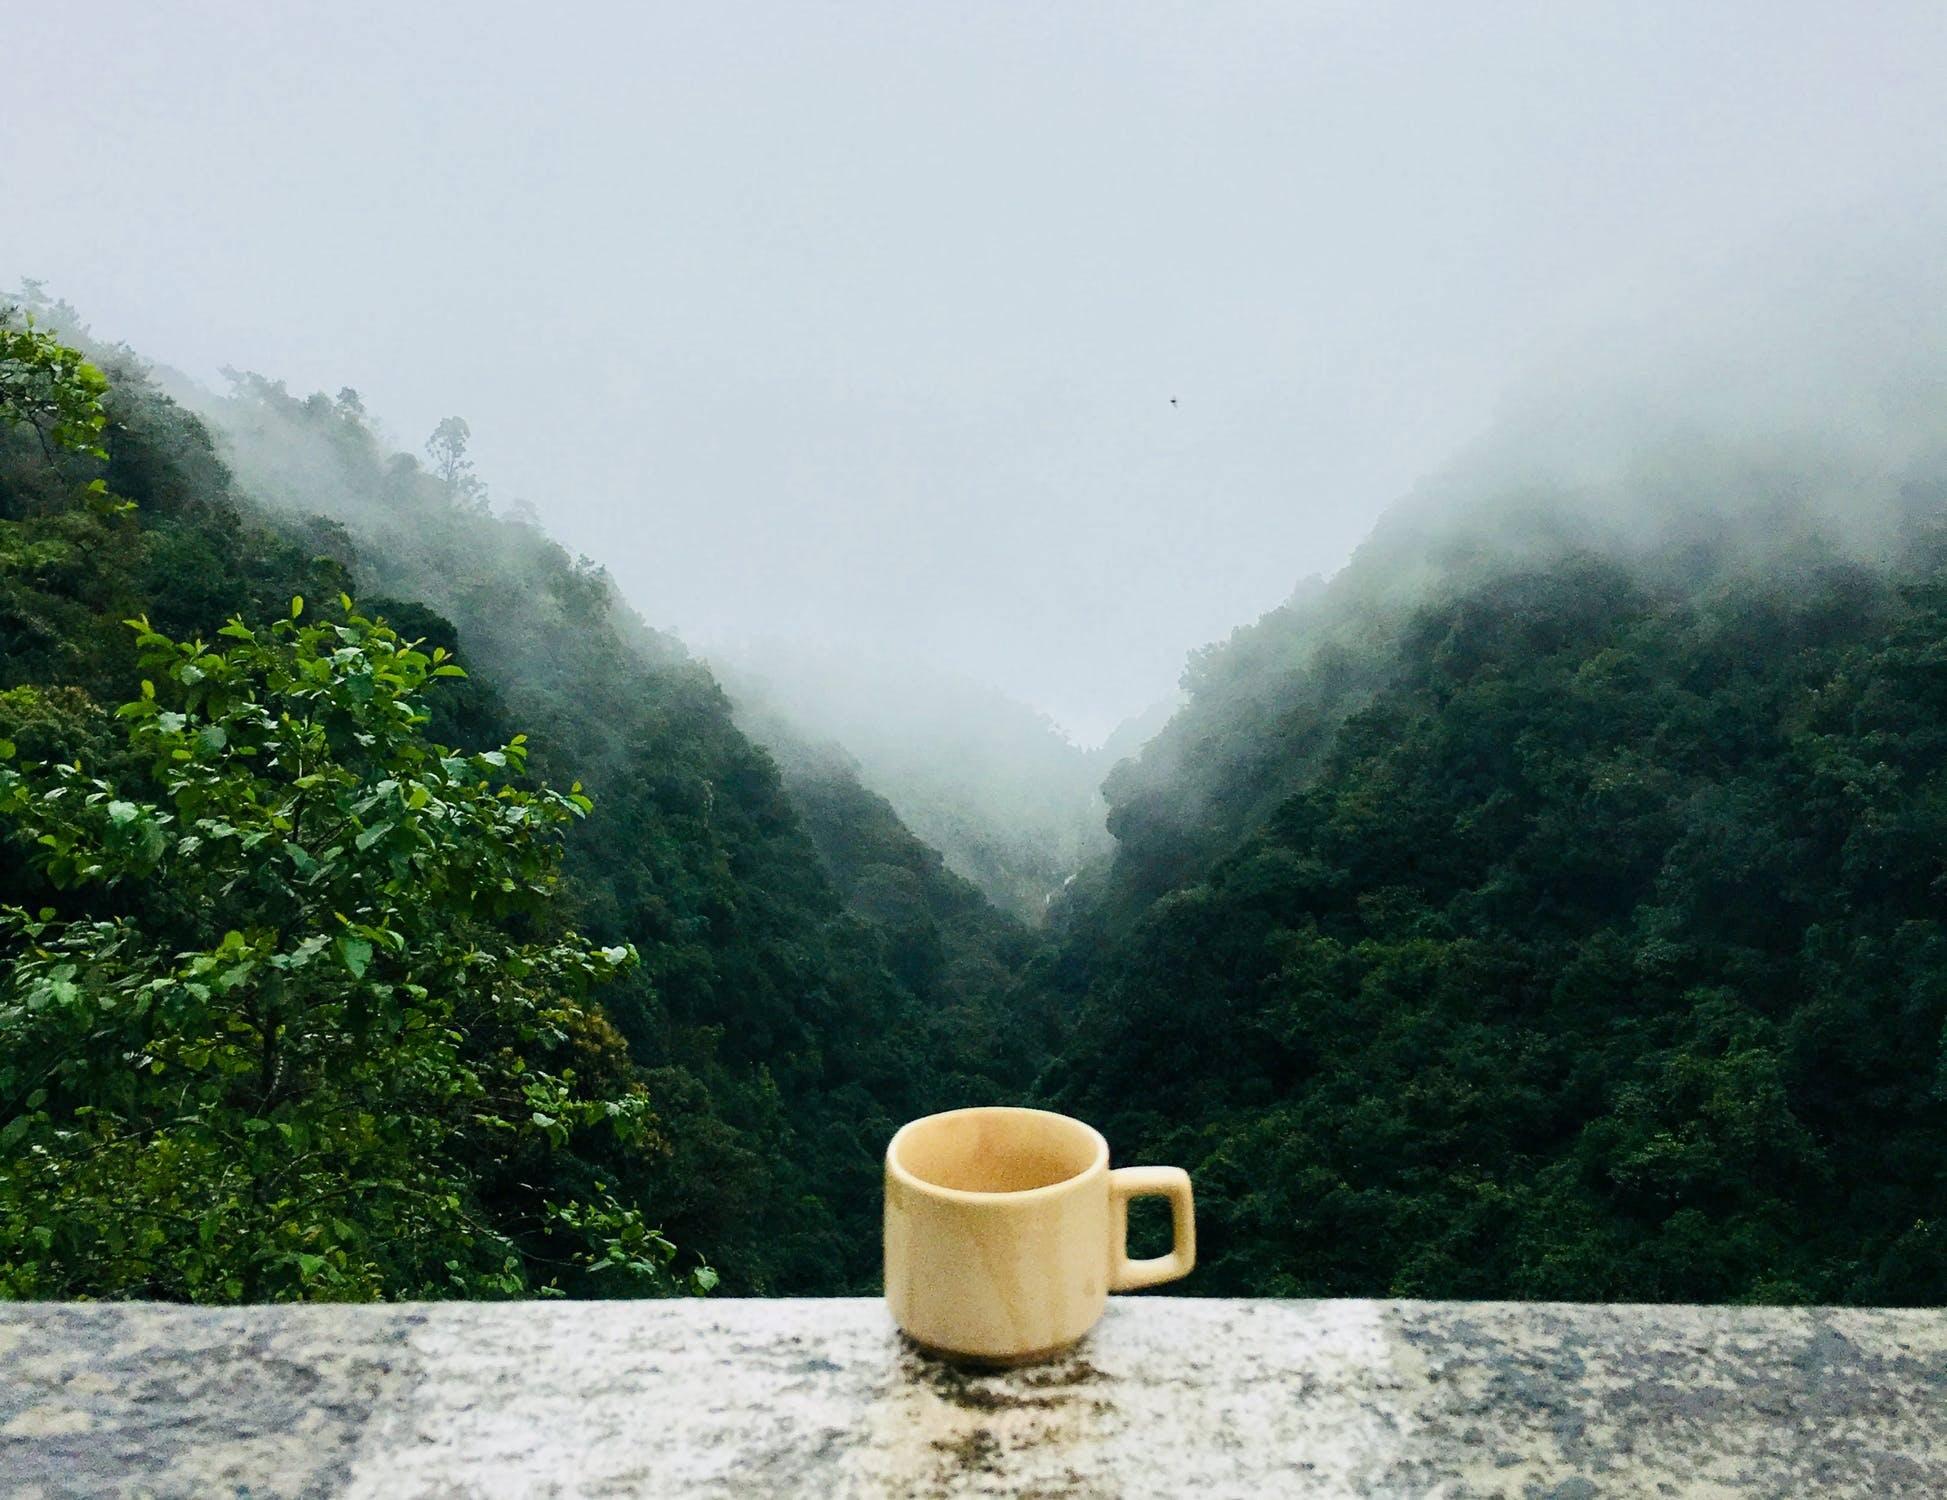 Tea Cup On A Ledge With A Jungle Backdrop